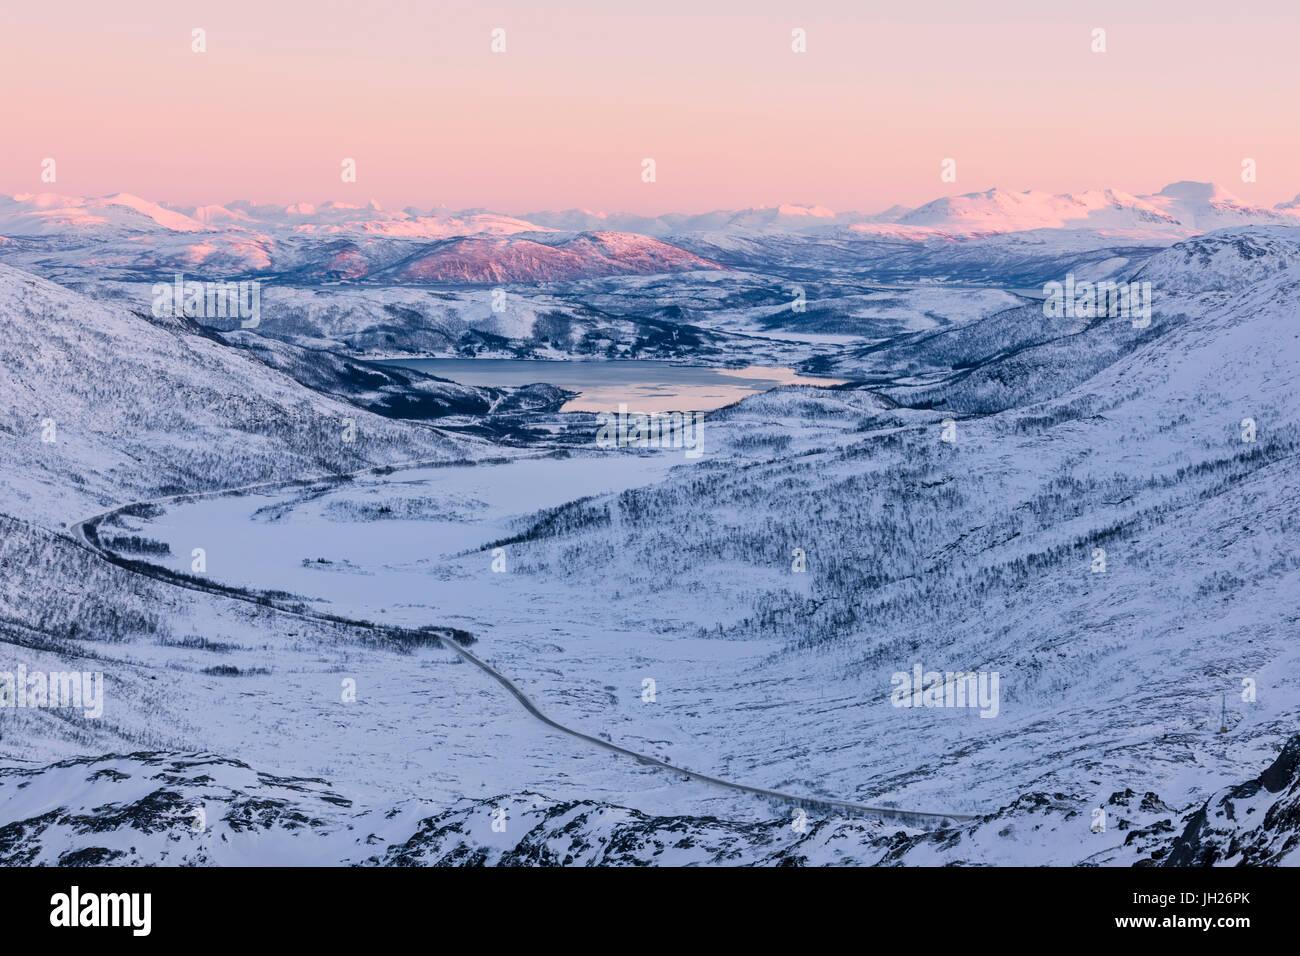 Pink sky at sunset on the snowy landscape and frozen sea surrounding Fjordbotn, Lysnes, Senja, Troms, Norway, Scandinavia - Stock Image